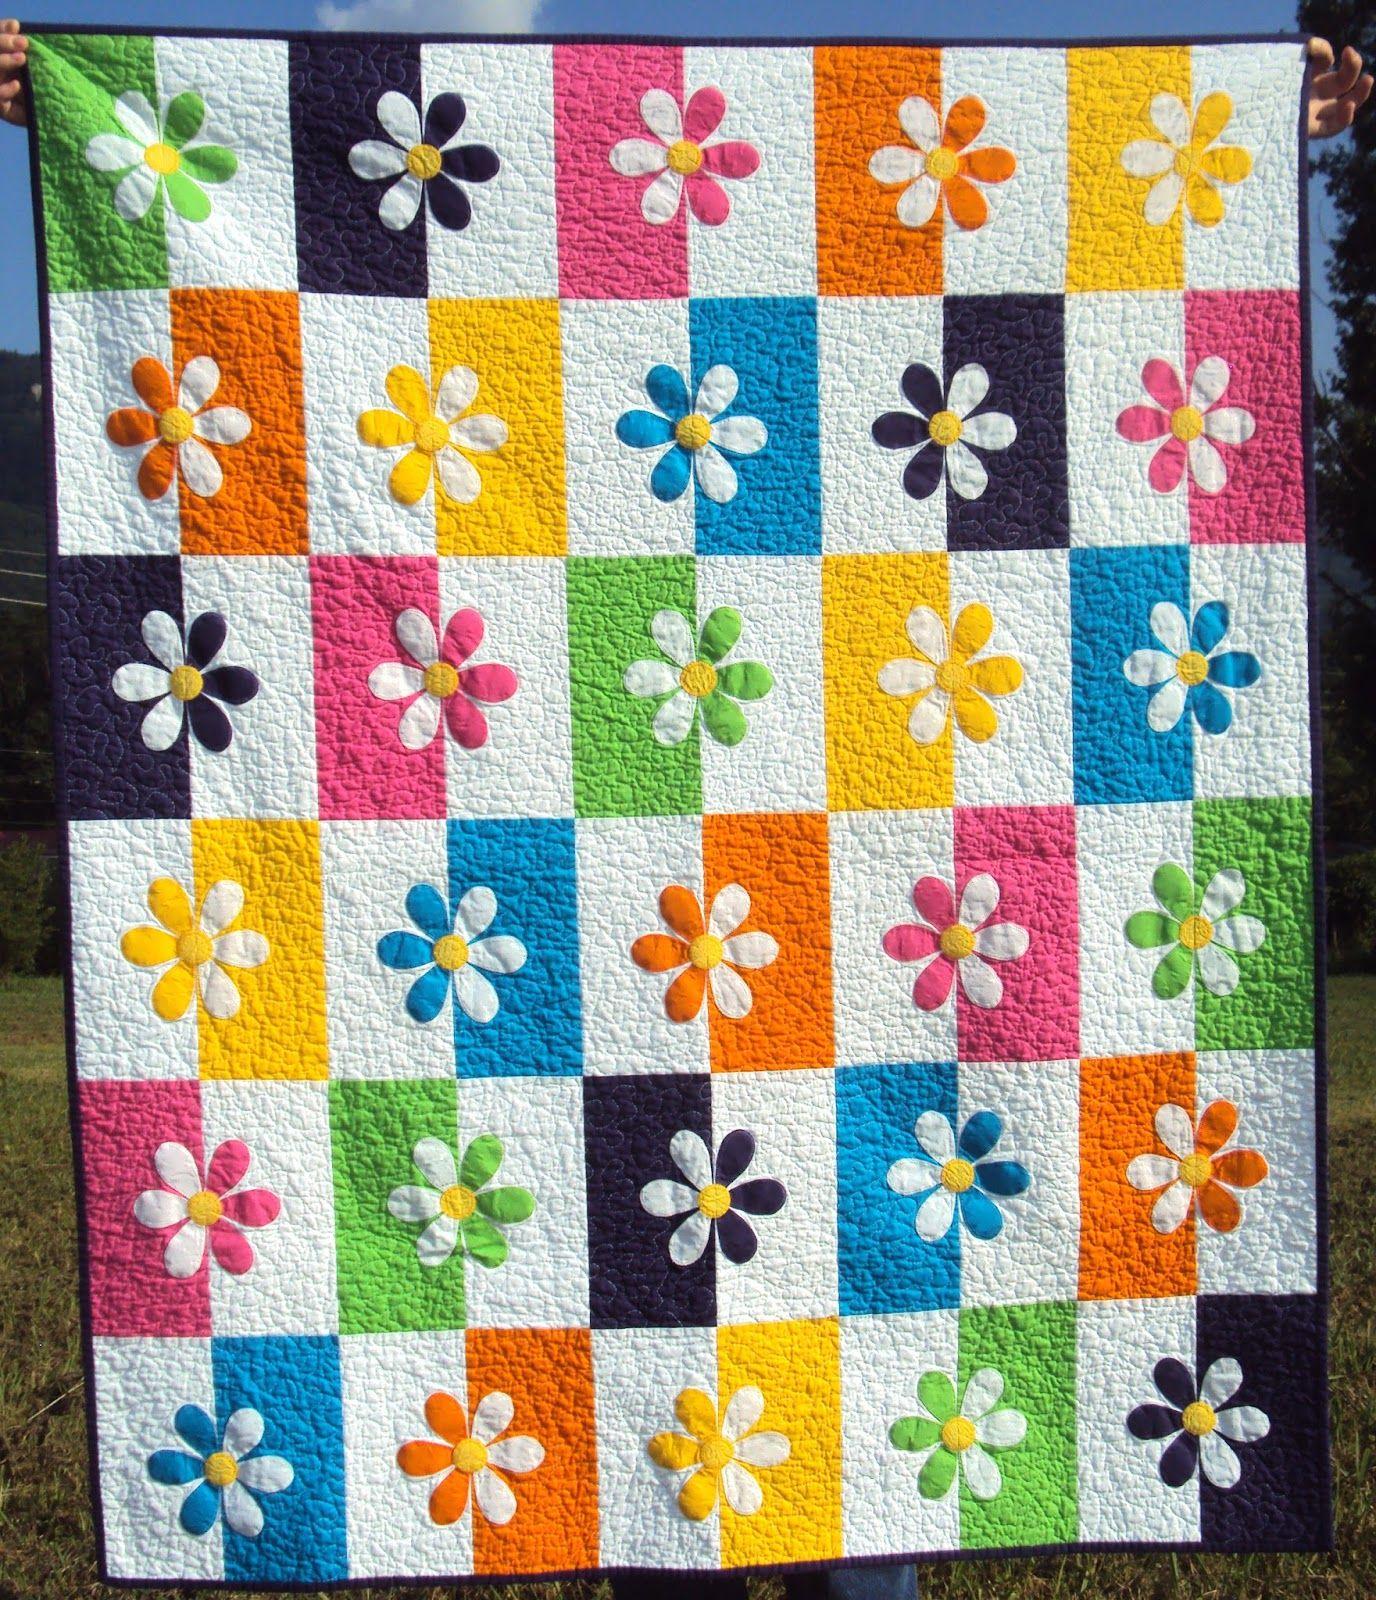 Goodbye Darling Lattice quilt in Paris Flea Market Plus quilt from ... : shadowed daisy quilt pattern free - Adamdwight.com